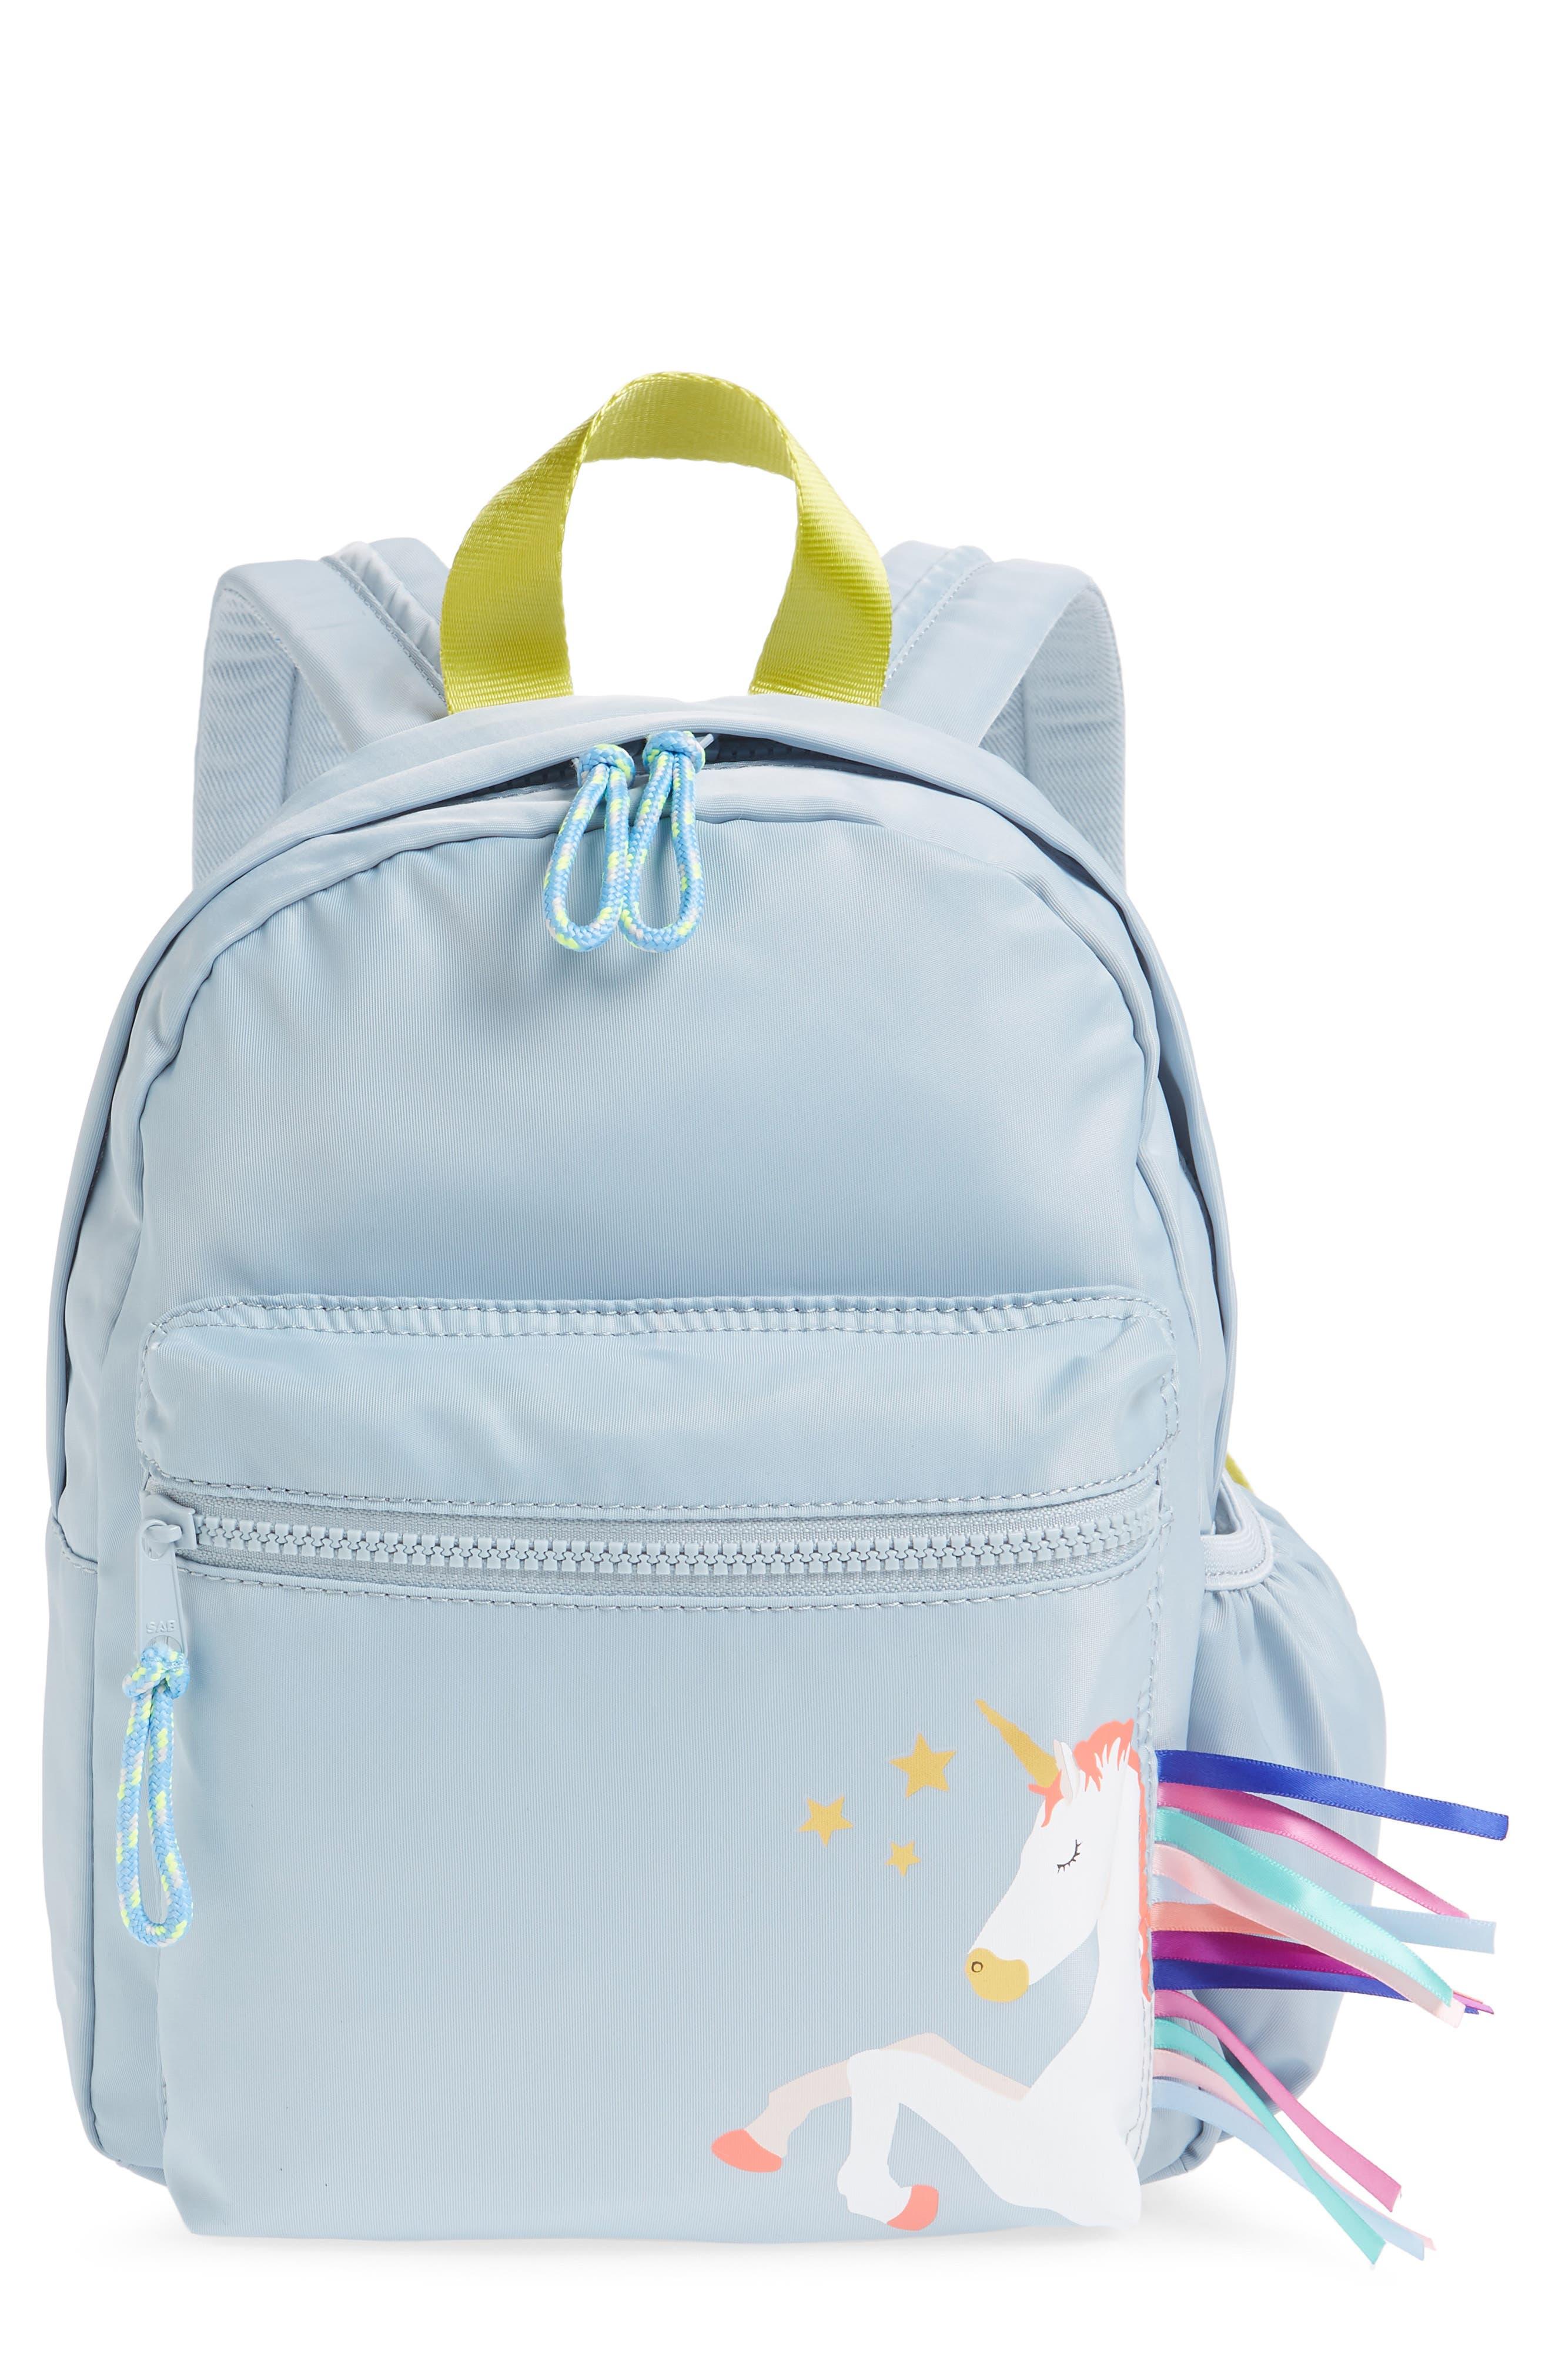 CREWCUTS BY J.CREW Unicorn Mini Backpack, Main, color, 500